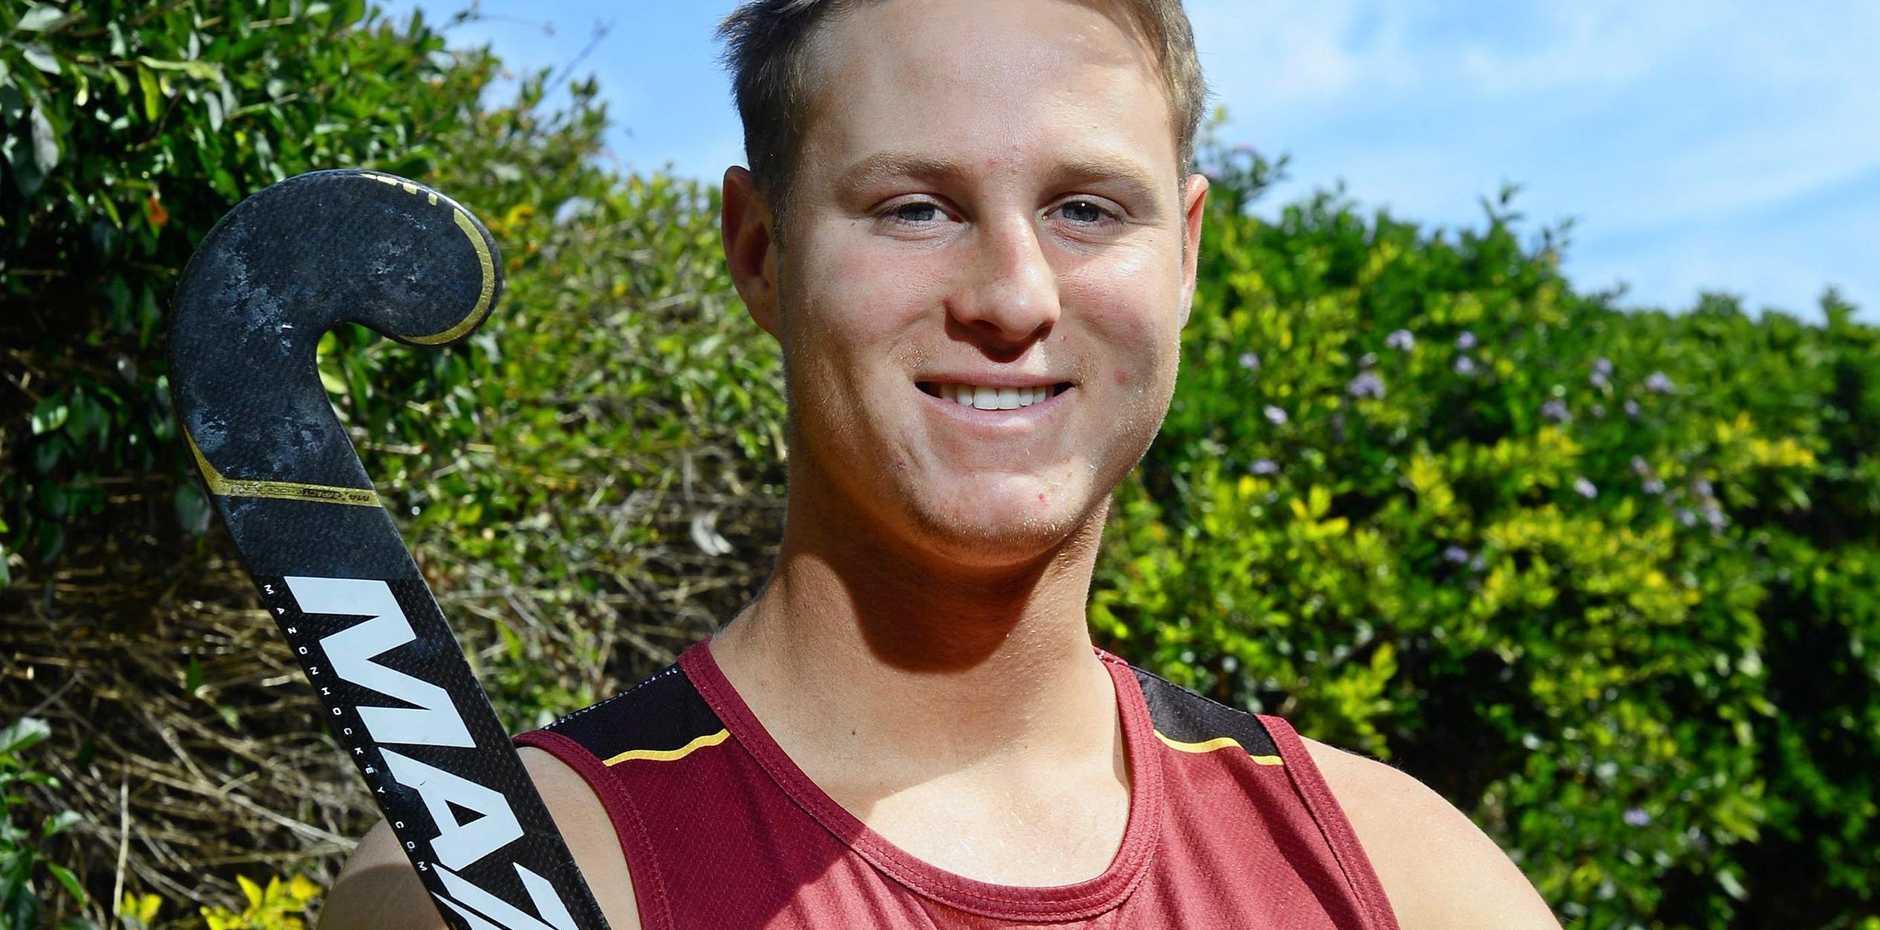 Queensland Blades goalkeeper Cade Banditt is preparing for the Australian Hockey League tournament in Perth.